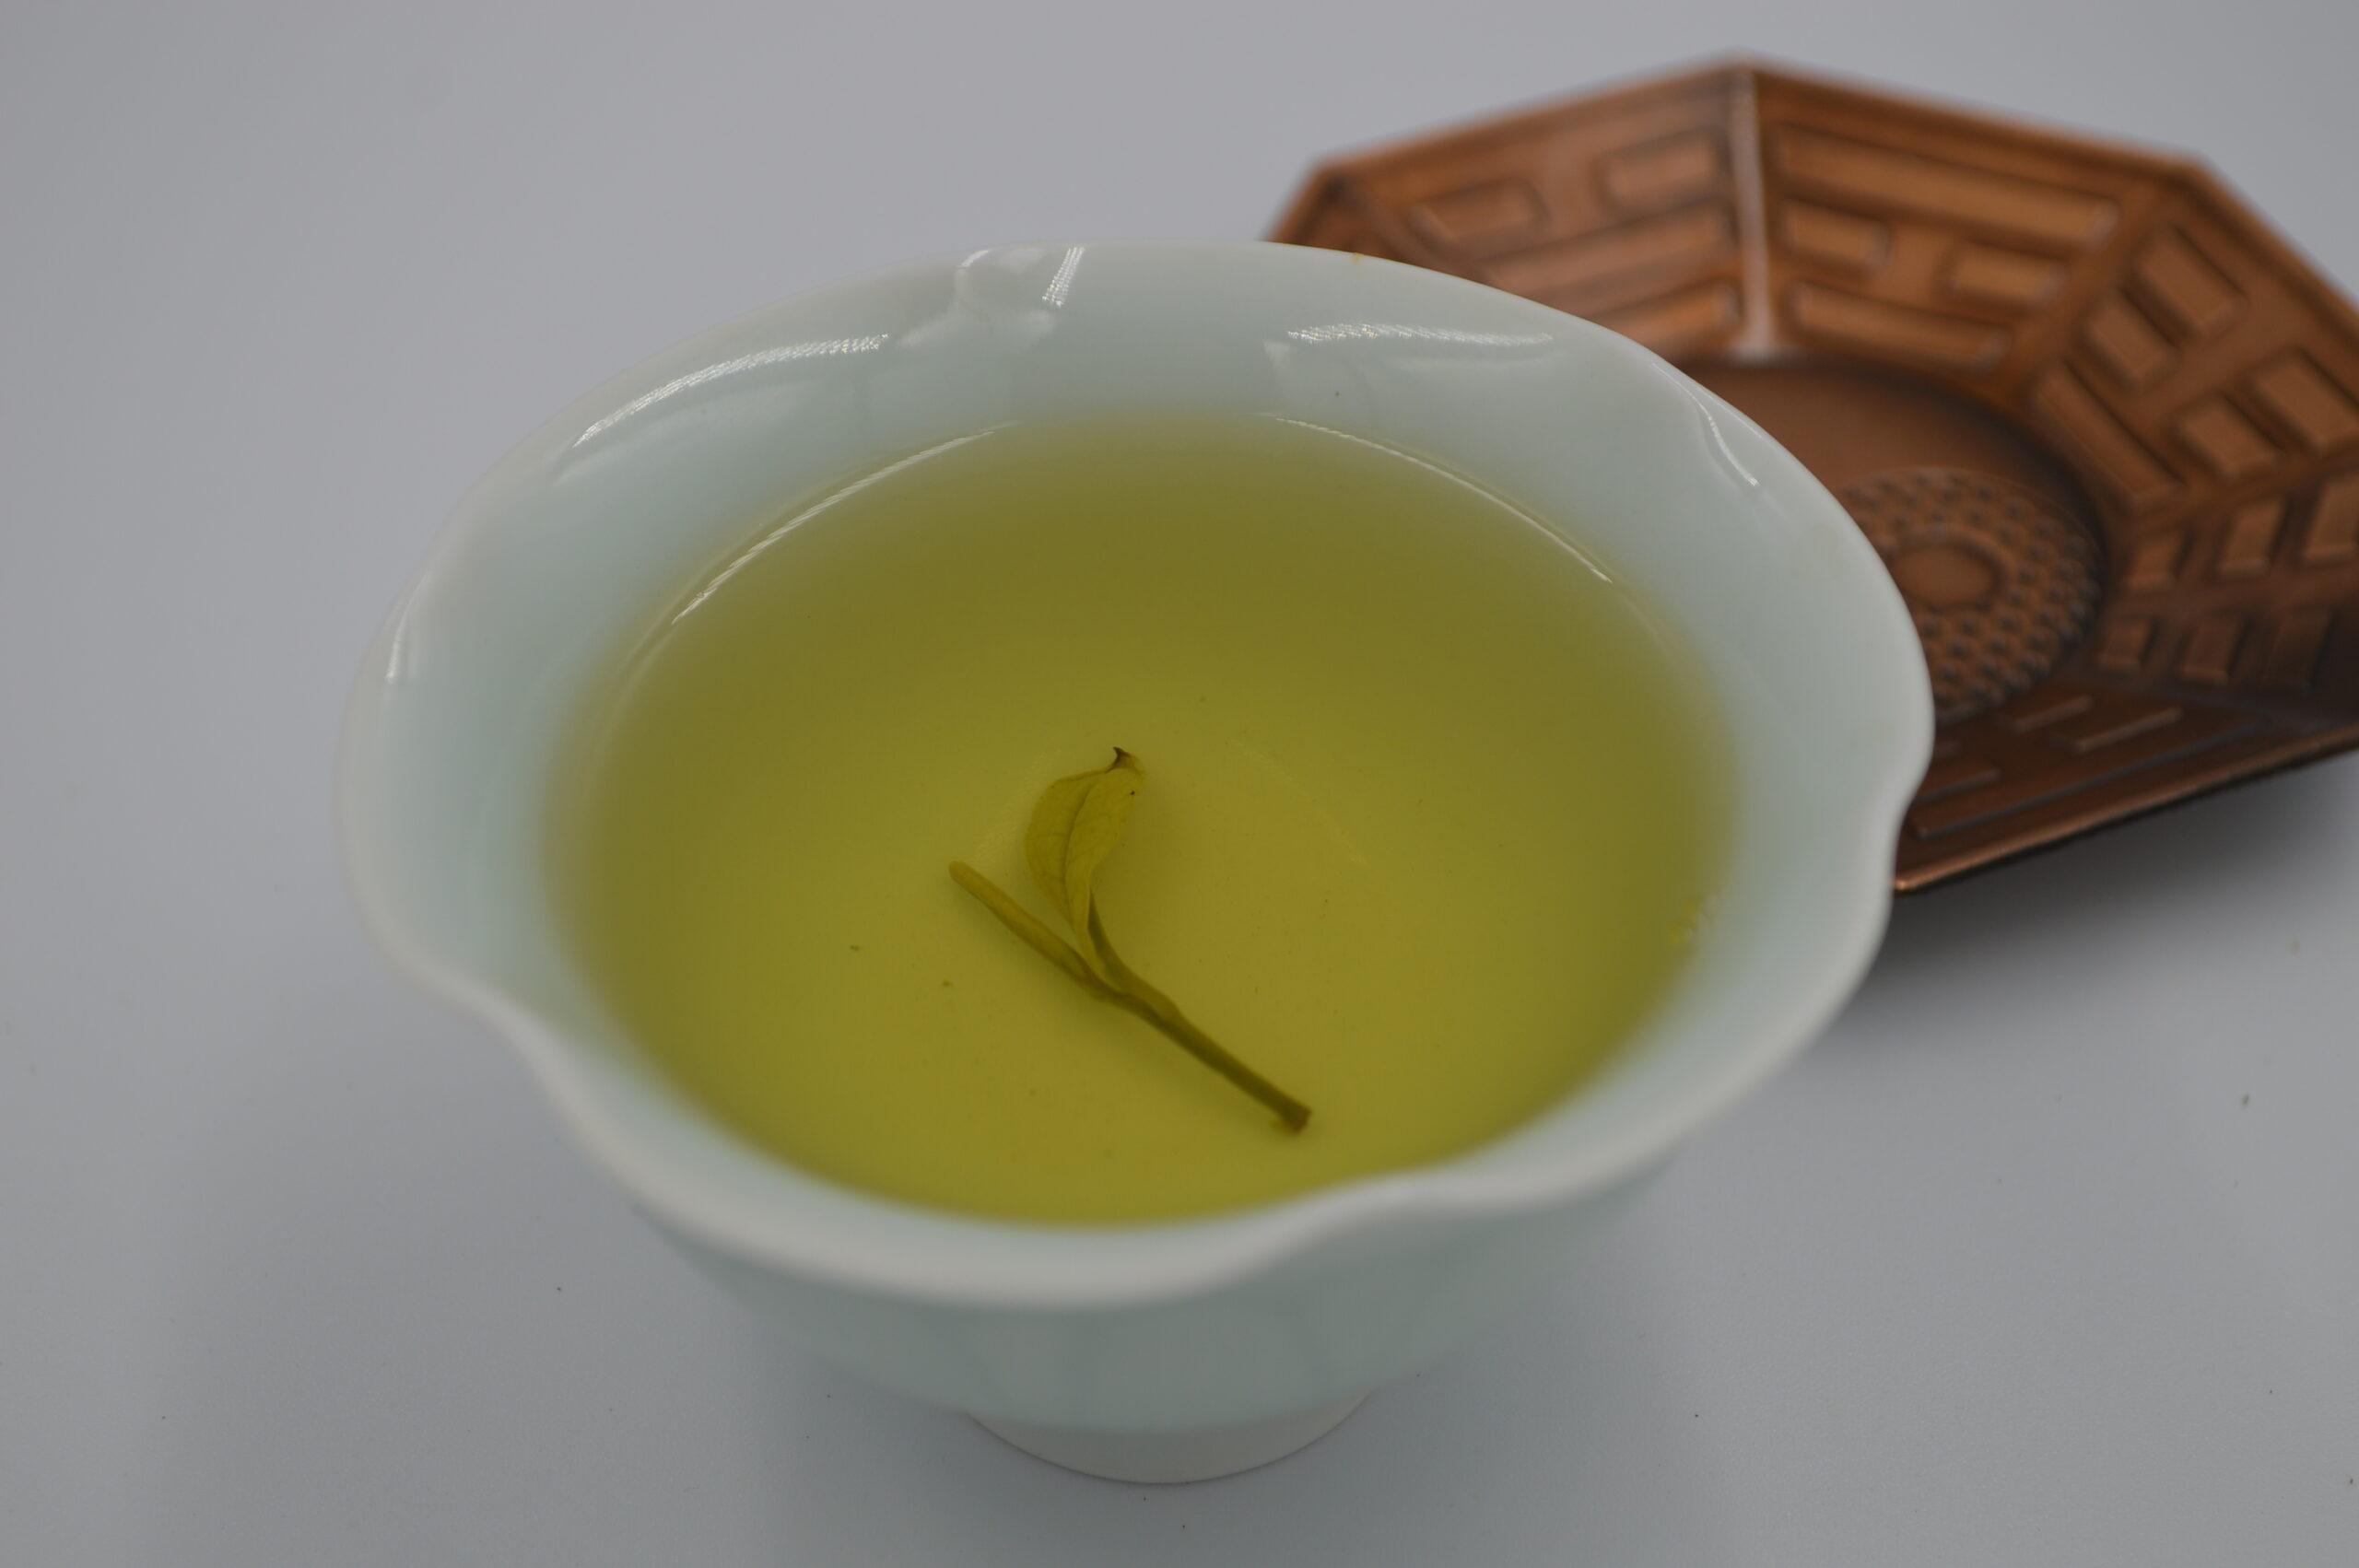 https://shop.liu-tea-art.com/wp-content/uploads/2021/04/DSC_0030-2-scaled.jpg